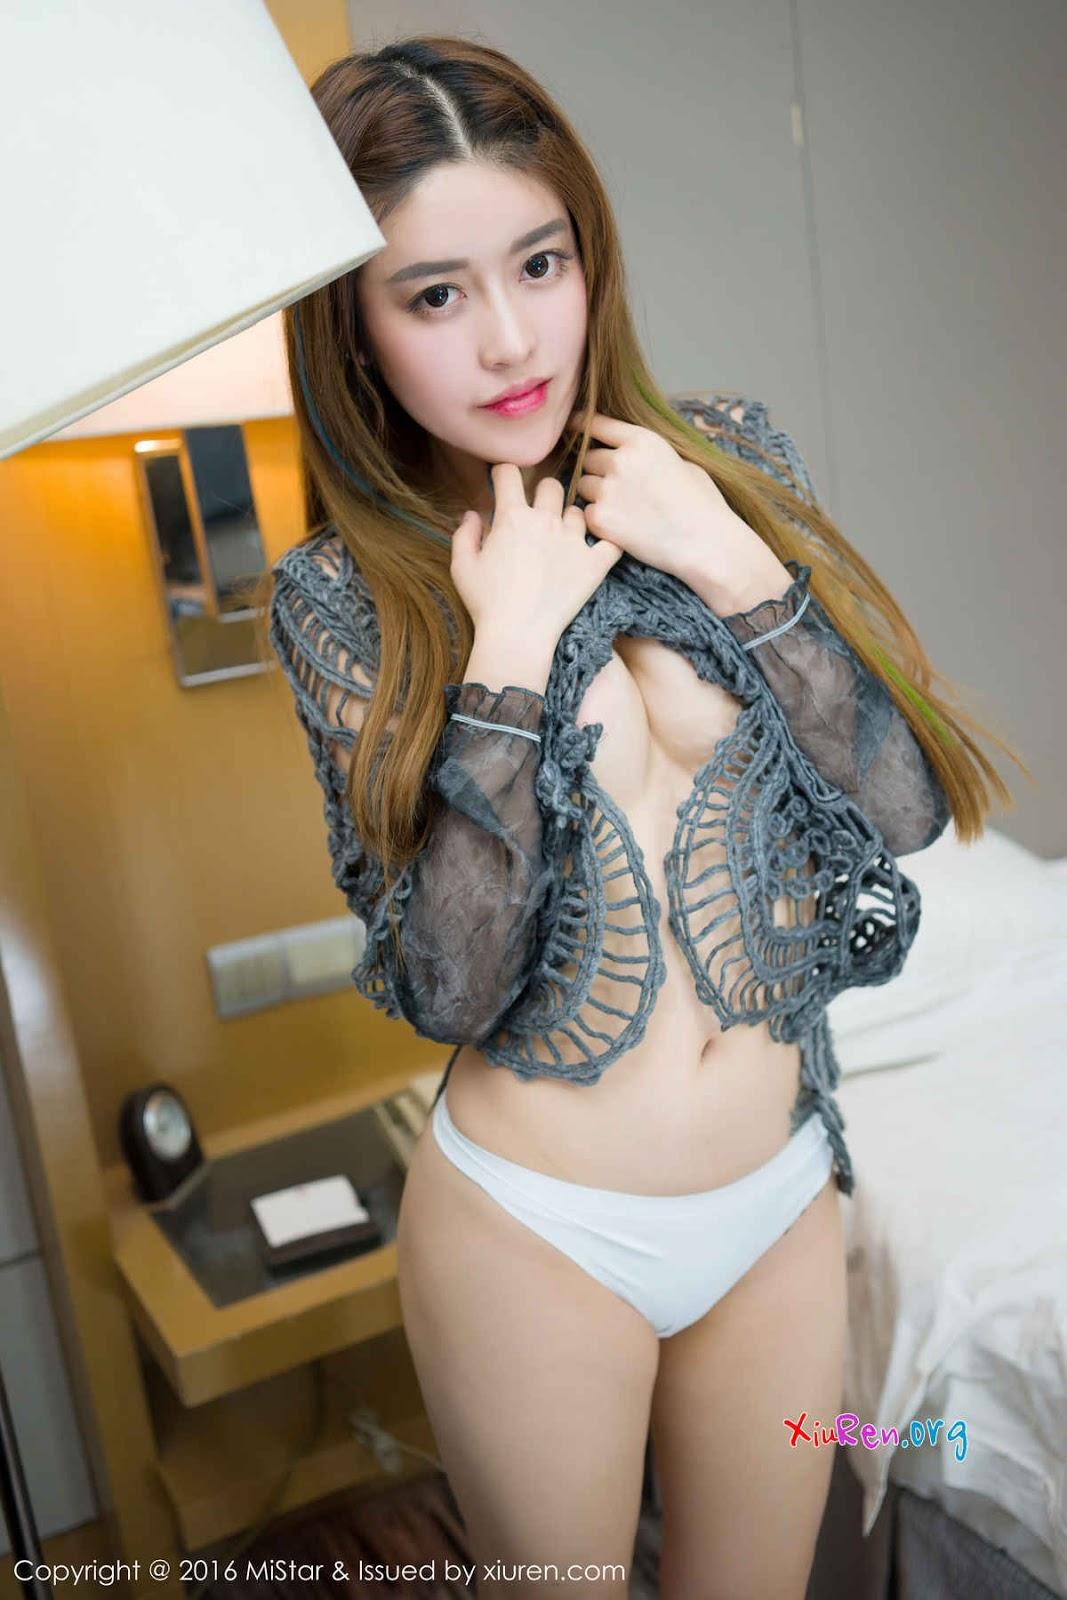 https://3.bp.blogspot.com/-ELrMobuYRBA/WHr0Aw9-eXI/AAAAAAAAO1o/B8UbHa0GC80PAS4I6JM0iujveN_PKPk_gCLcB/s1600/xinh-sexy-6.jpg